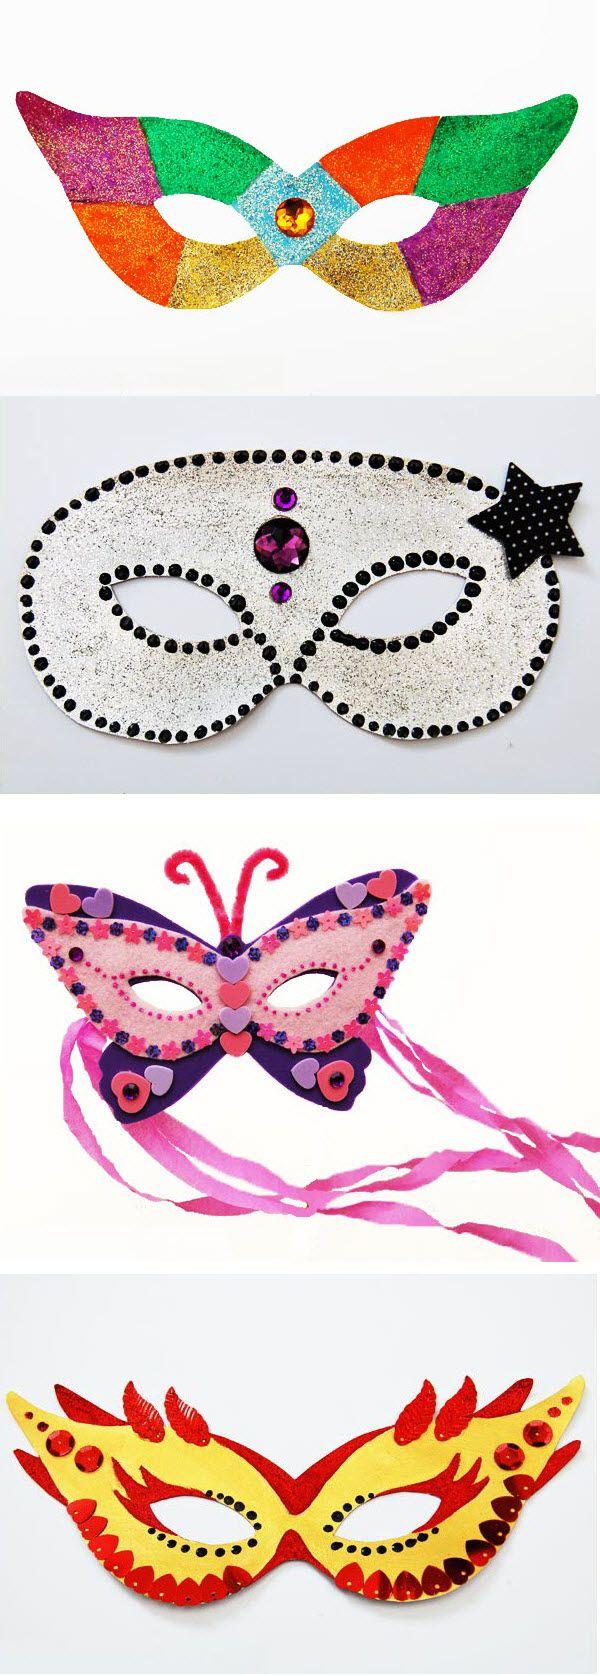 Masques carnaval faire soi meme patron a imprimer free imprintable kid 39 s thing masque - Masque papillon carnaval ...